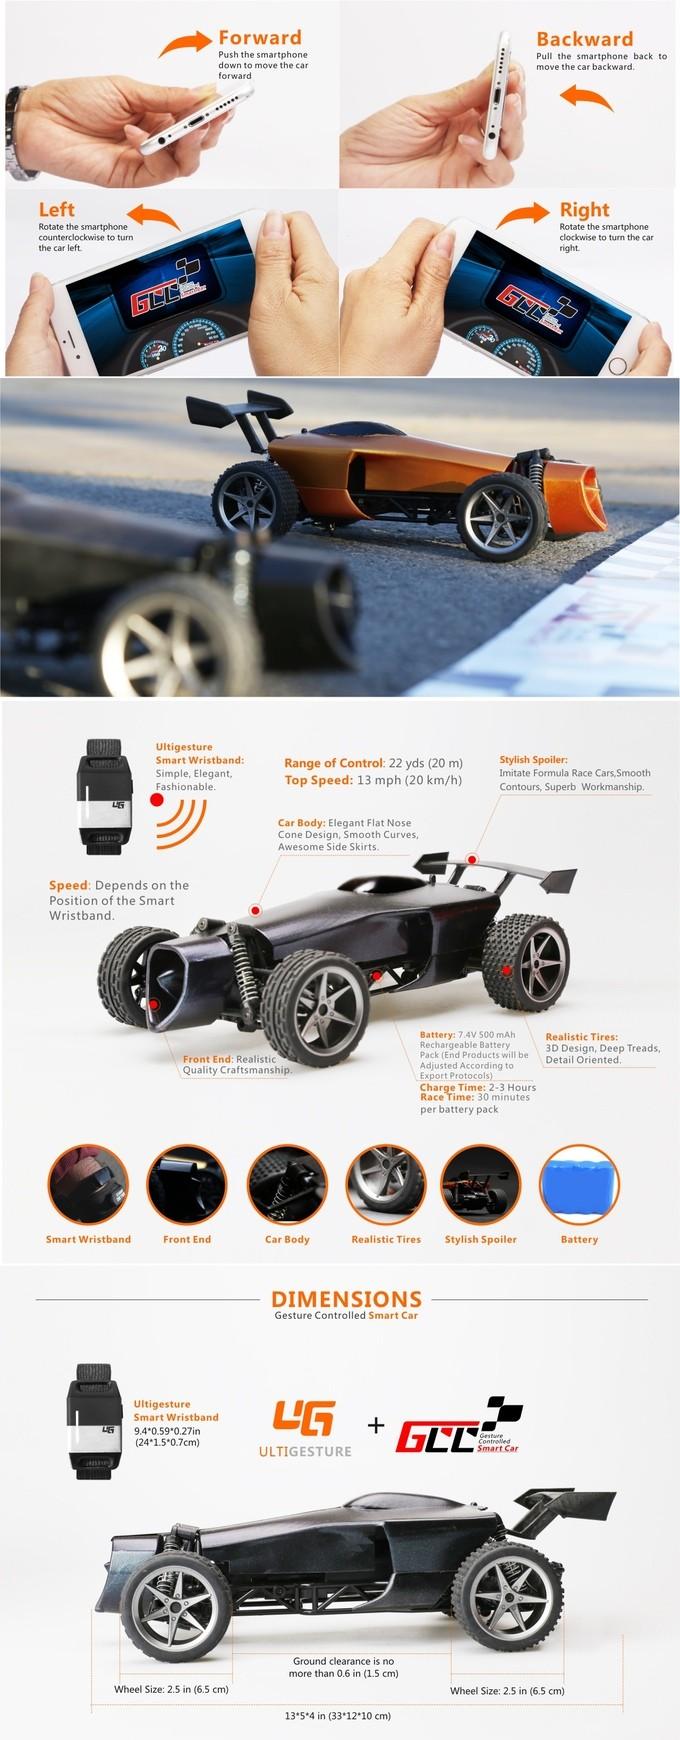 Traxxas XO1 Worlds Fastest RC Supercar at 100 MPH  autoevolution